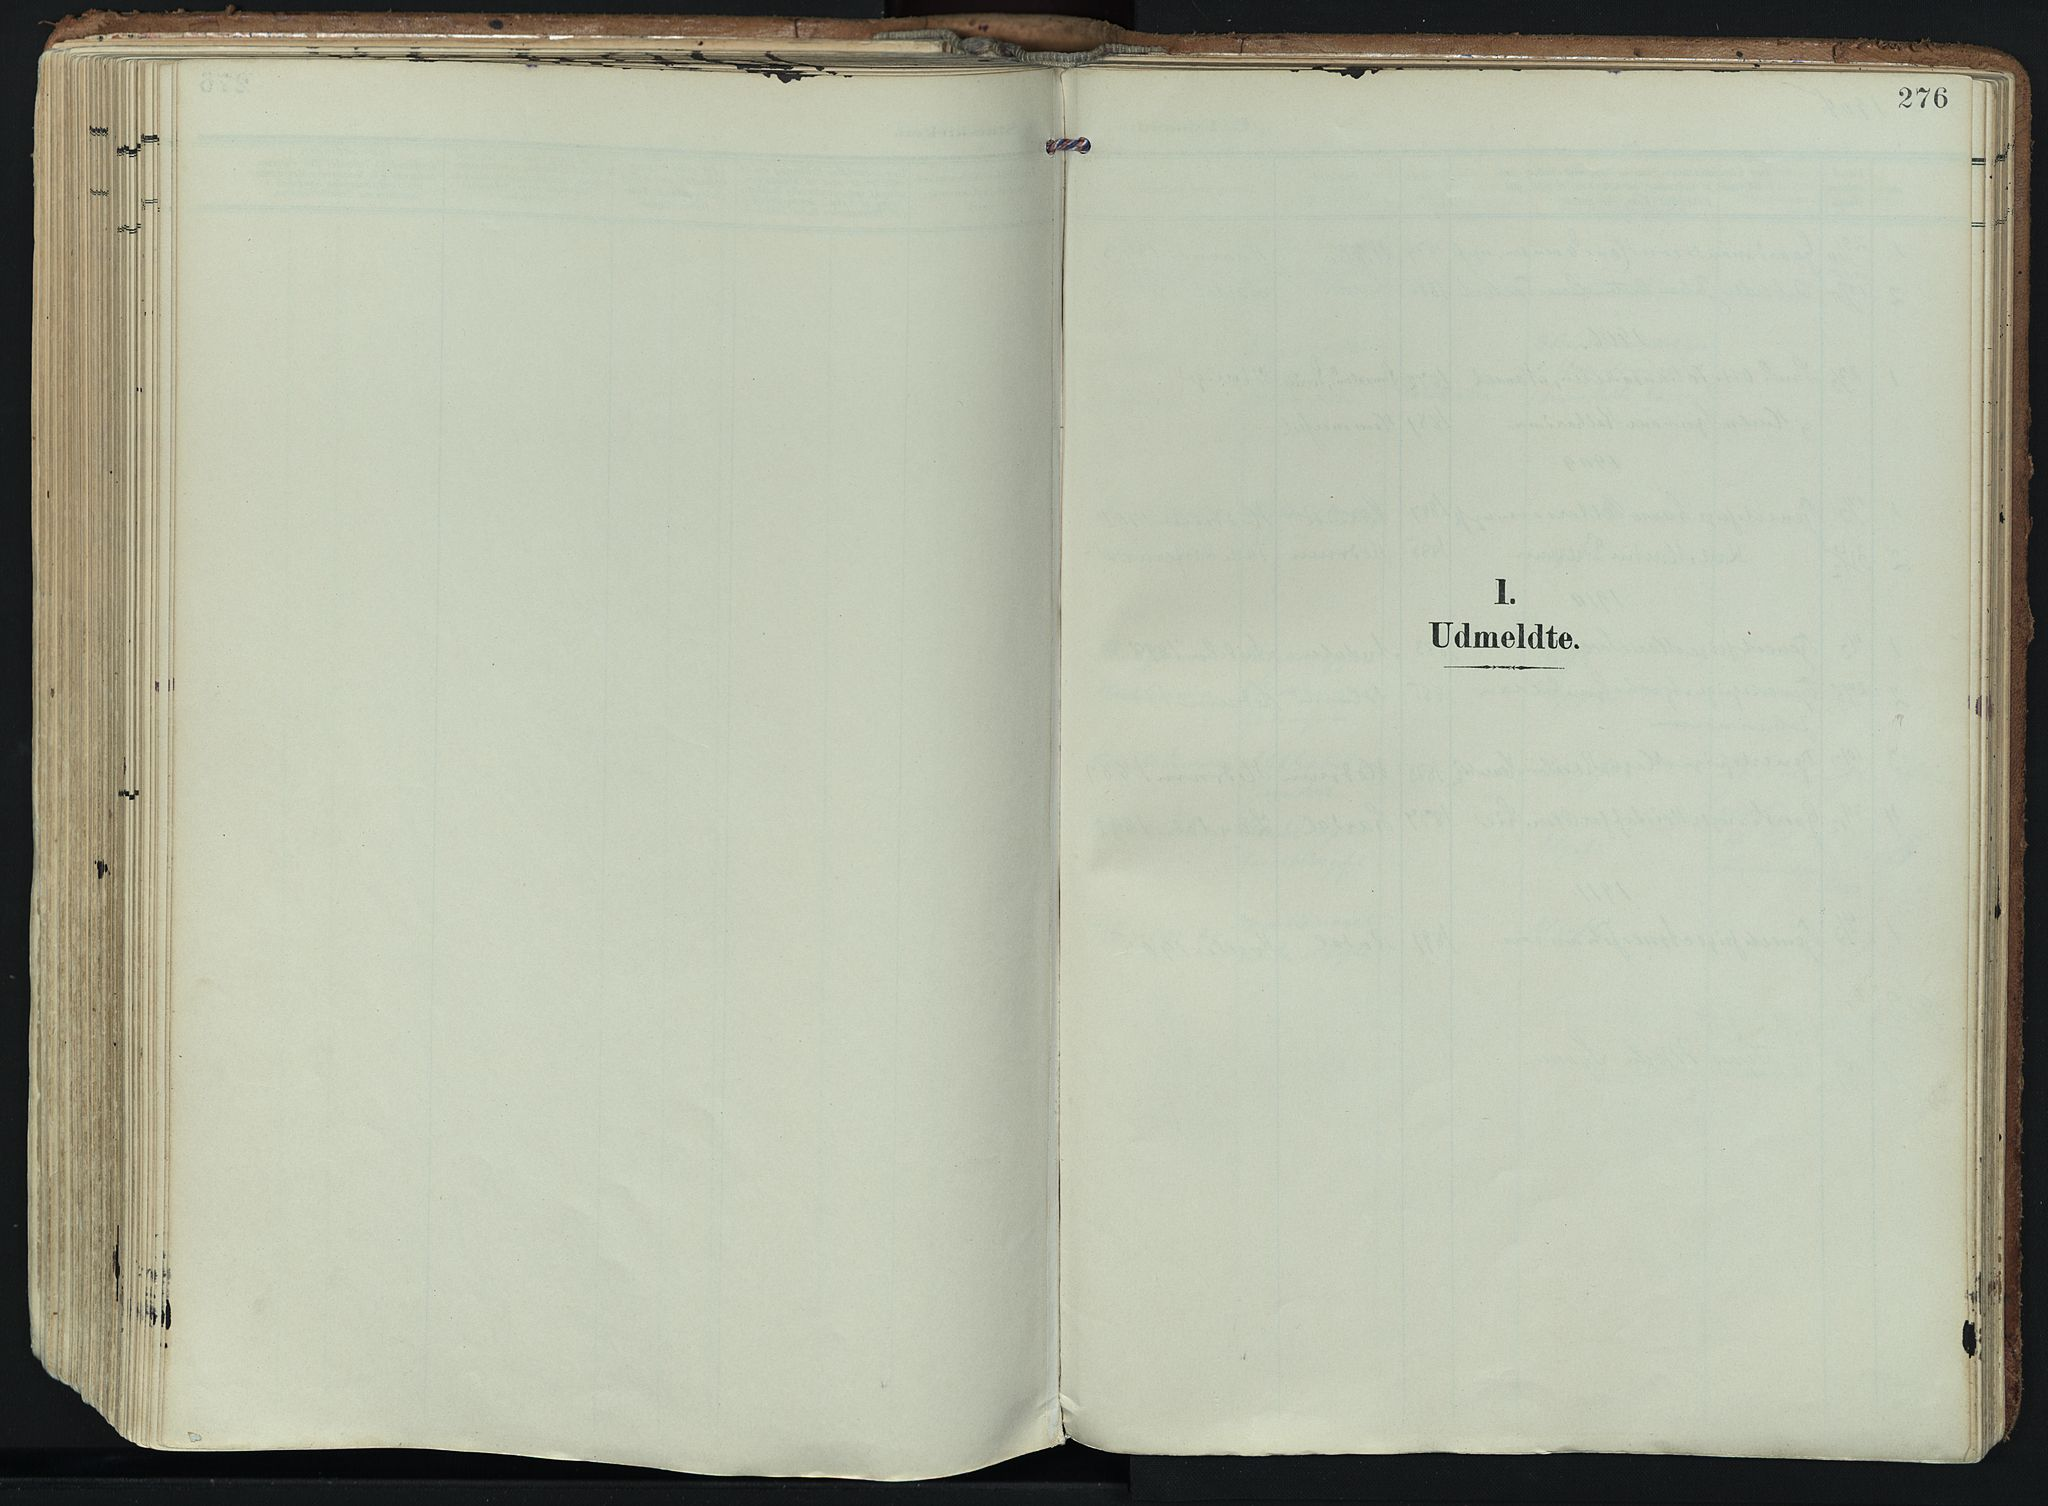 SAKO, Hedrum kirkebøker, F/Fa/L0010: Ministerialbok nr. I 10, 1904-1918, s. 276